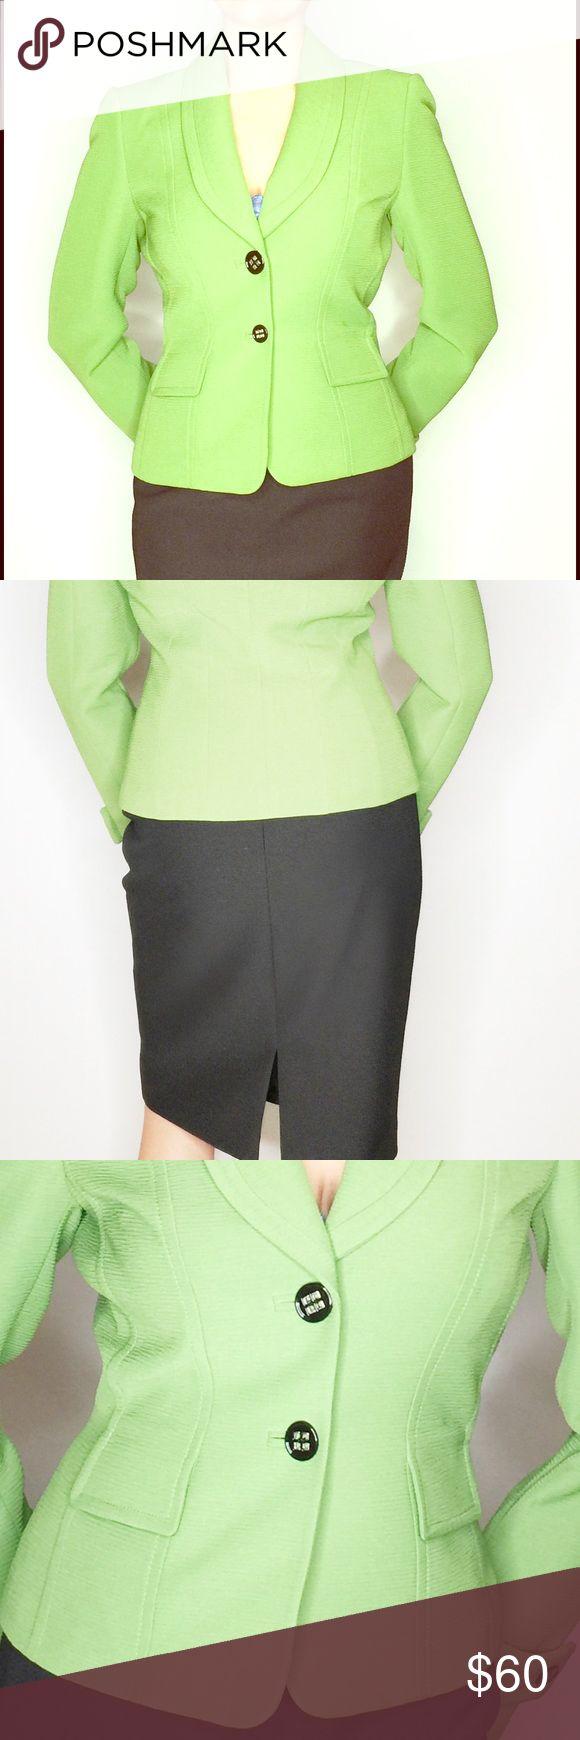 Ladies Tahari skirt suit Worn 3 times. Perfect for the sophisticated woman that wants to get the job ✅ #workwear #Tahari #womens #workattire #ladies Work it! Tahari Skirts Skirt Sets